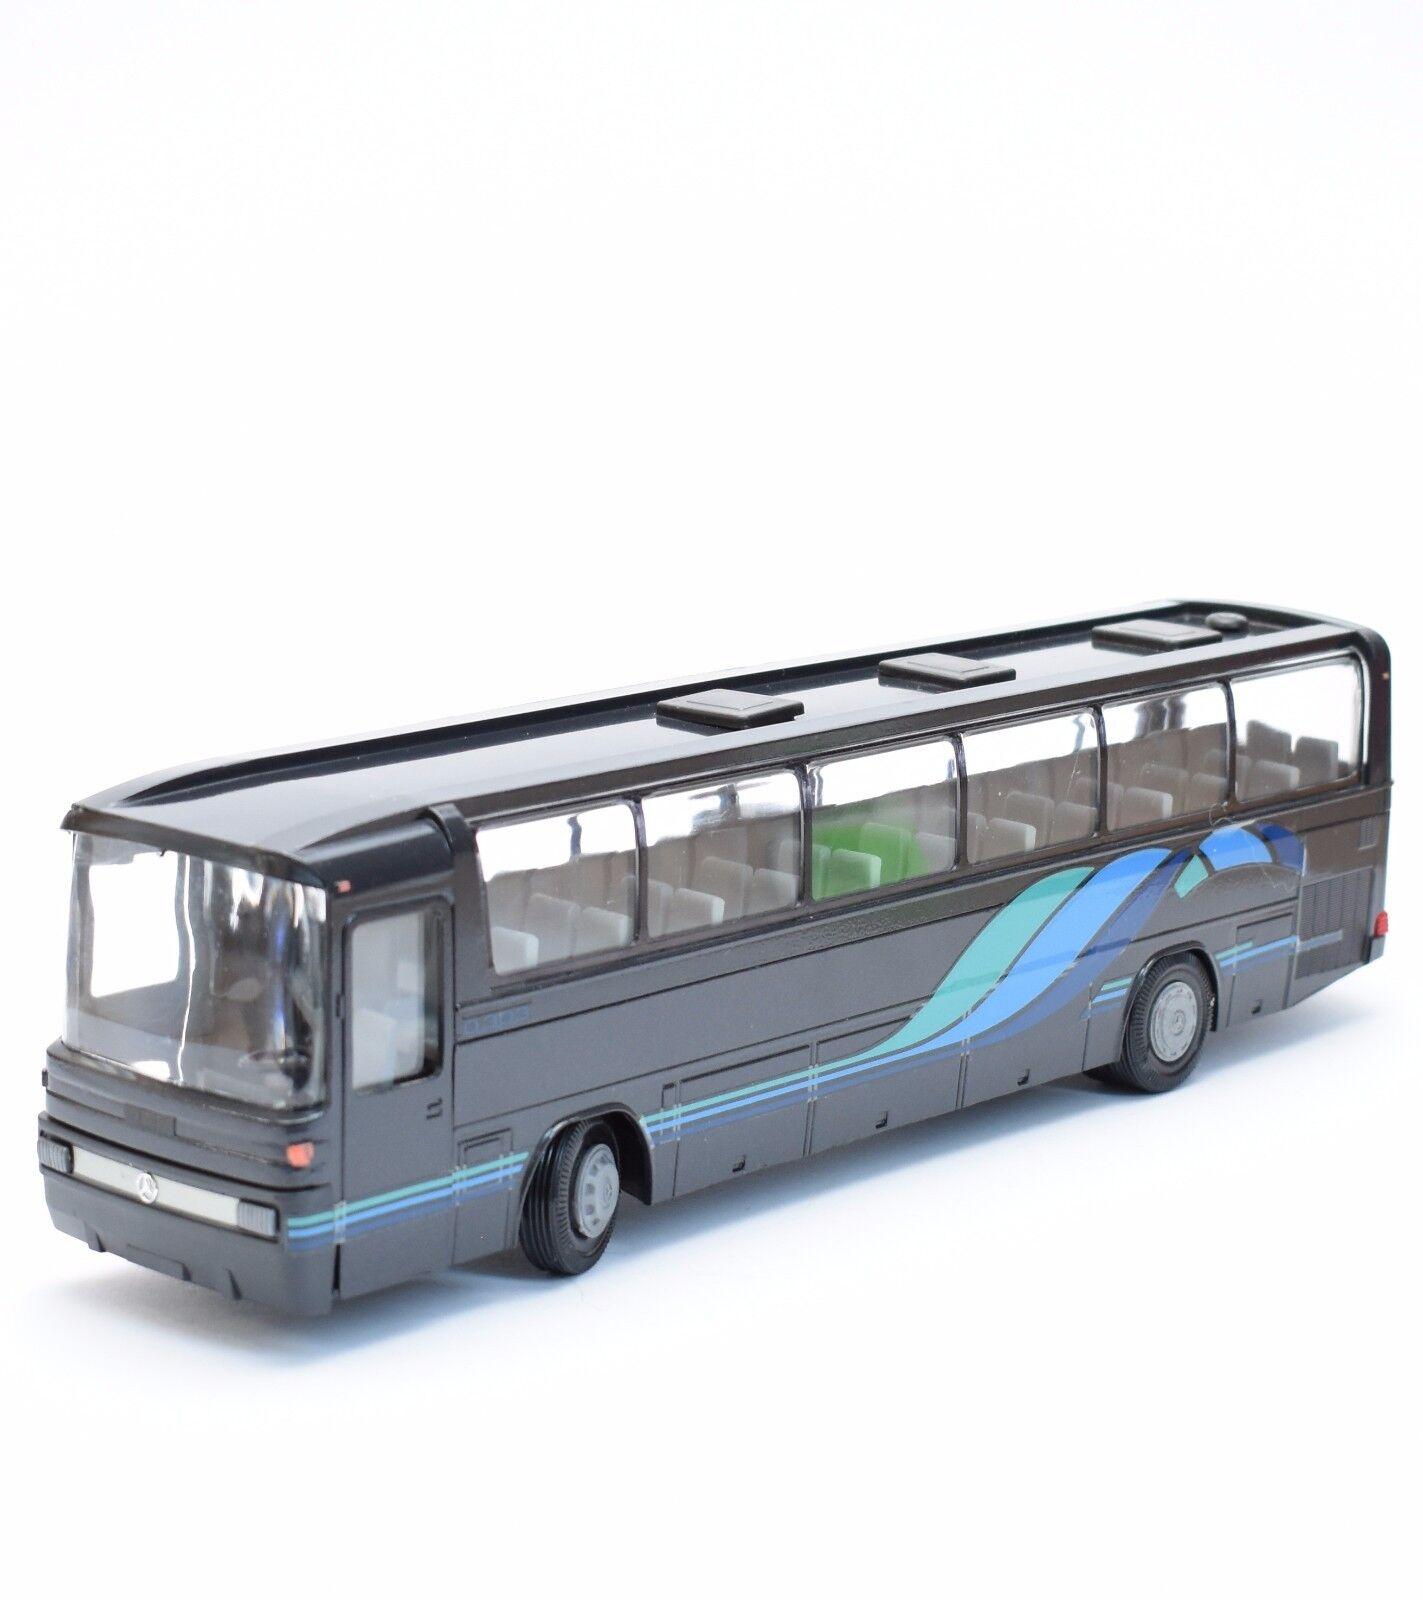 NZG 420 Mercedes Benz 4 Sterne Omnibus 0 303 RHS  1 40 , OVP, B306